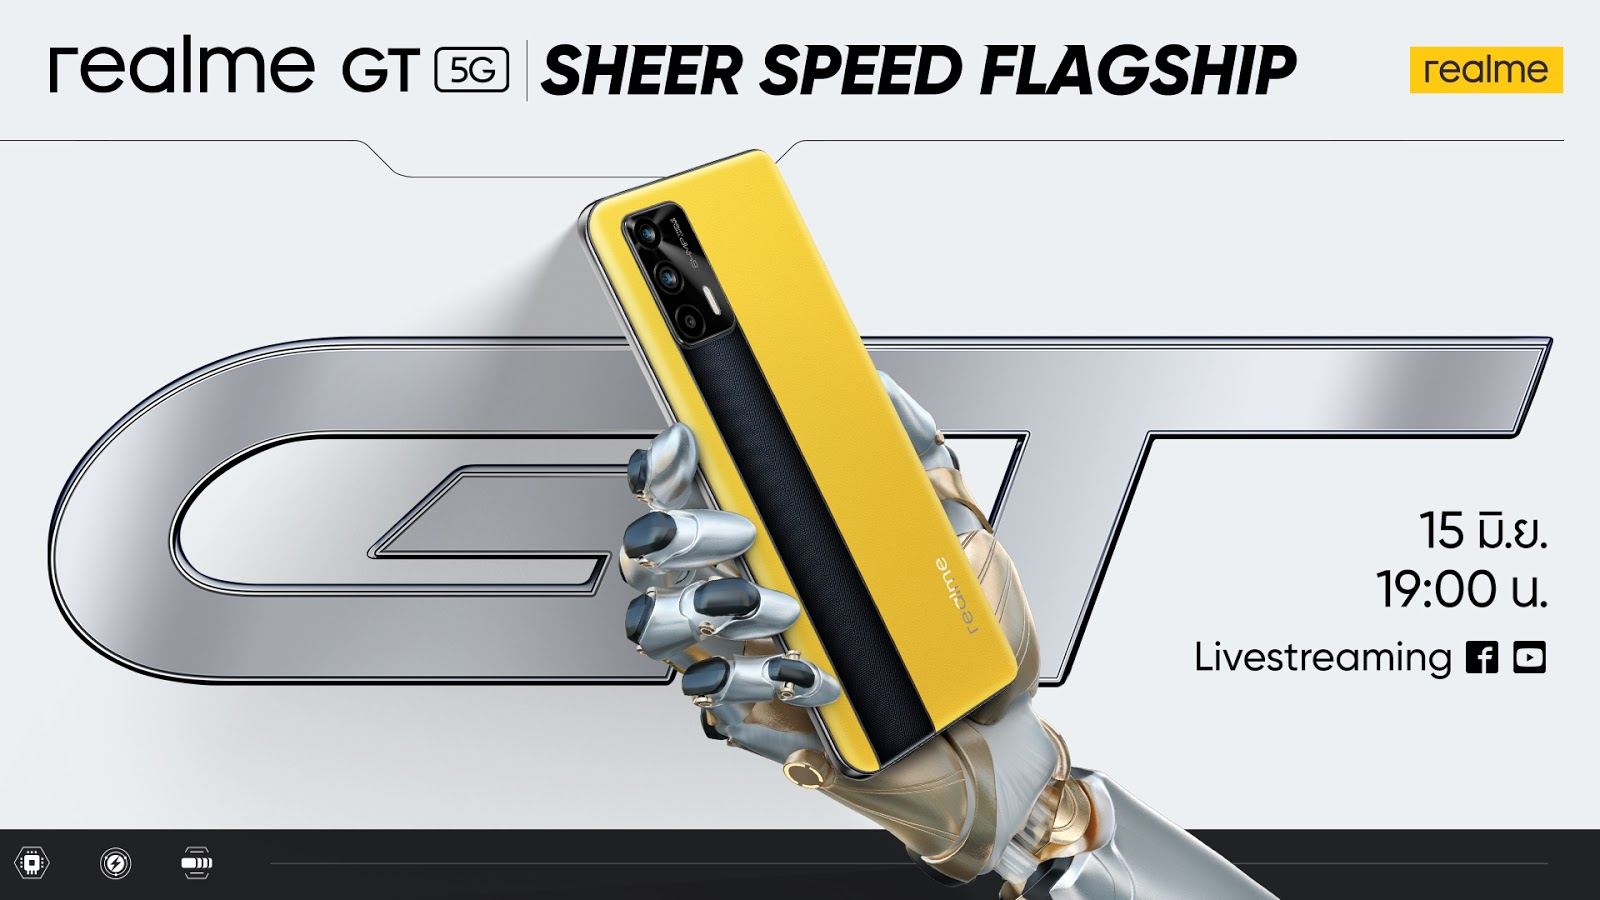 "realme GT คนจับตามองและรอคอย พร้อมเปิดตัวในวันอังคารที่ 15 มิถุนายน เวลา 19:00 น. ด้วยสโลแกน ""Sheer Speed Flagship"""